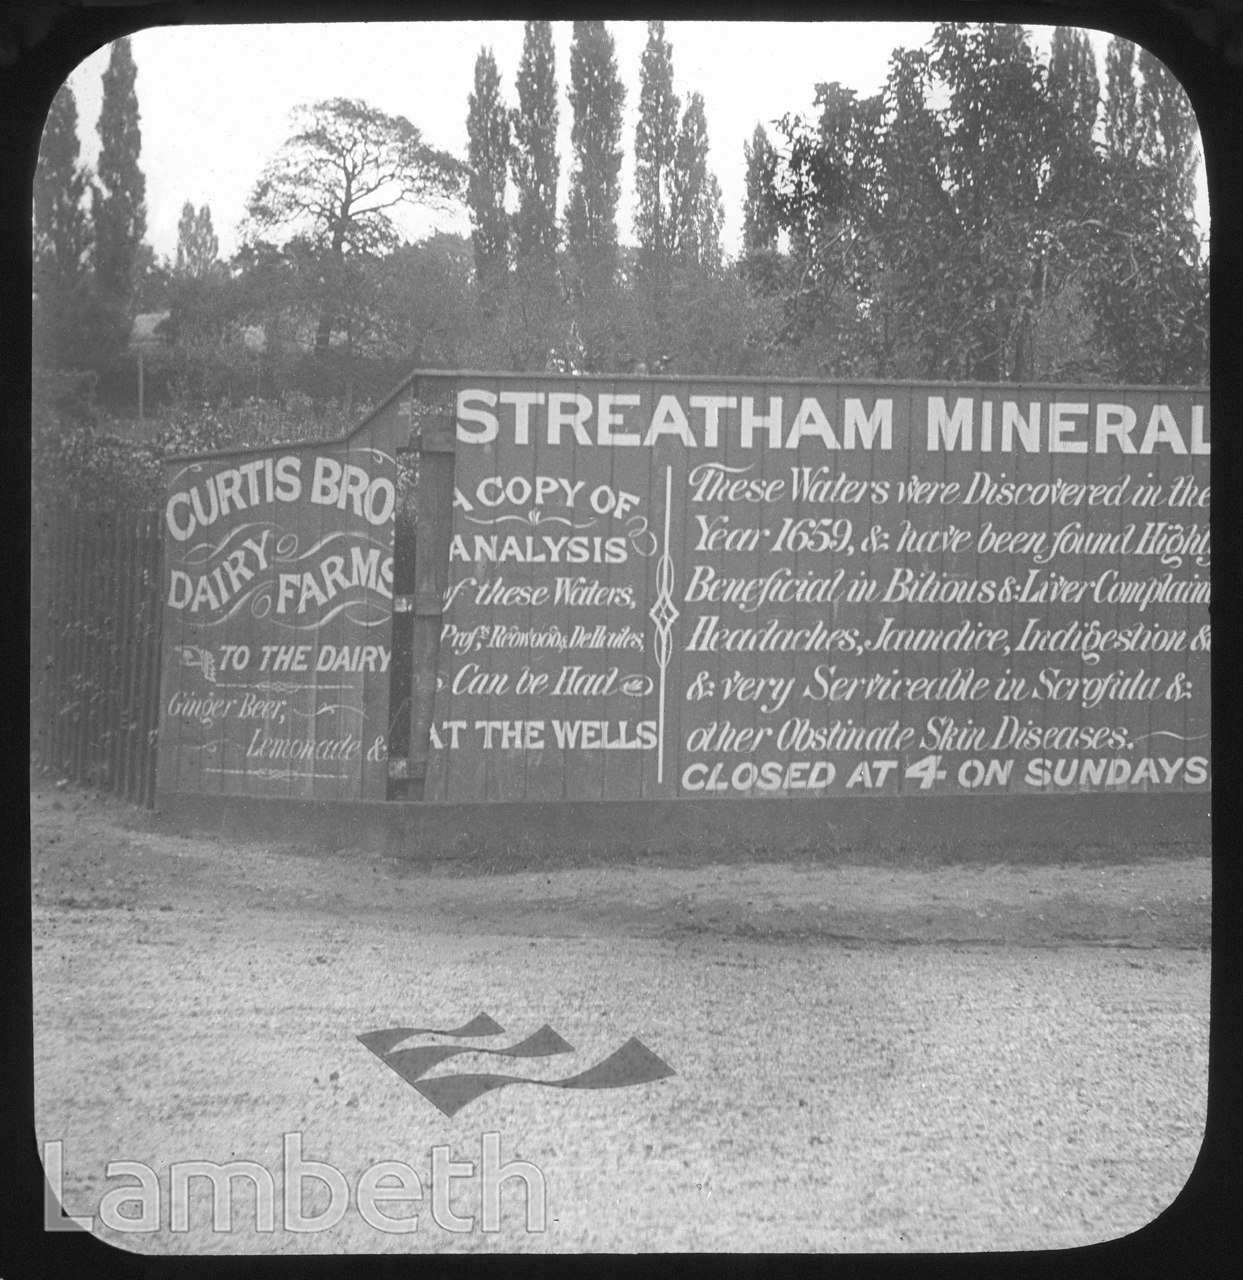 STREATHAM MINERAL WELLS/ CURTIS BROS DAIRY, VALLEY ROAD